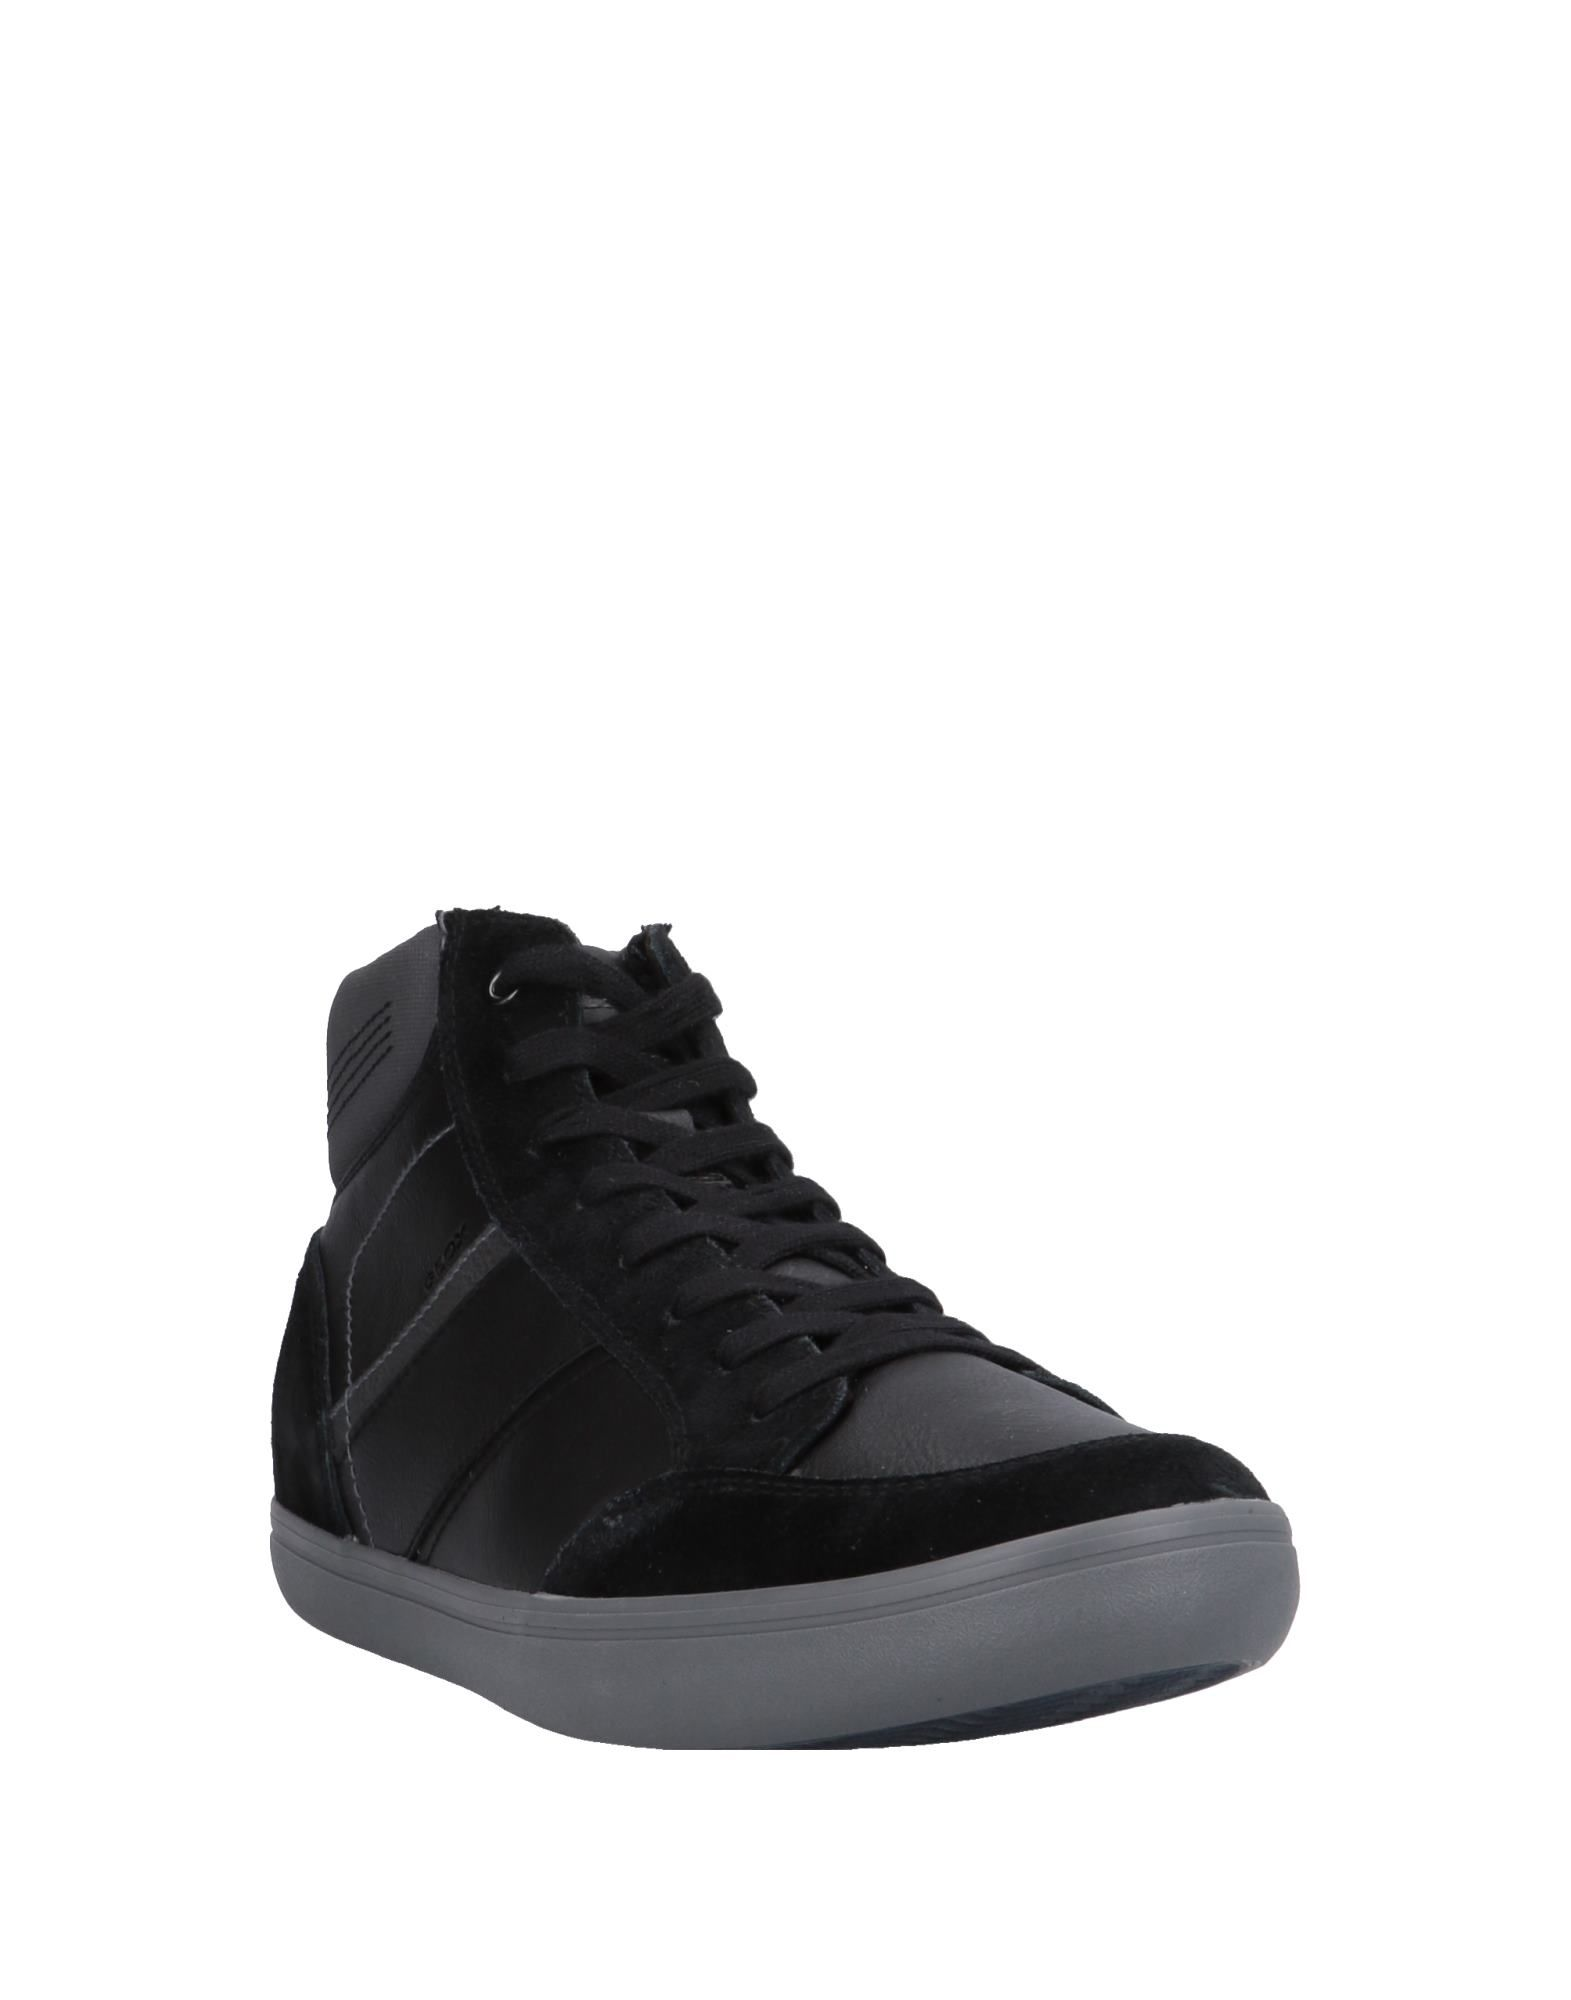 Geox Sneakers Sneakers Geox Herren  11564777FM bd0220